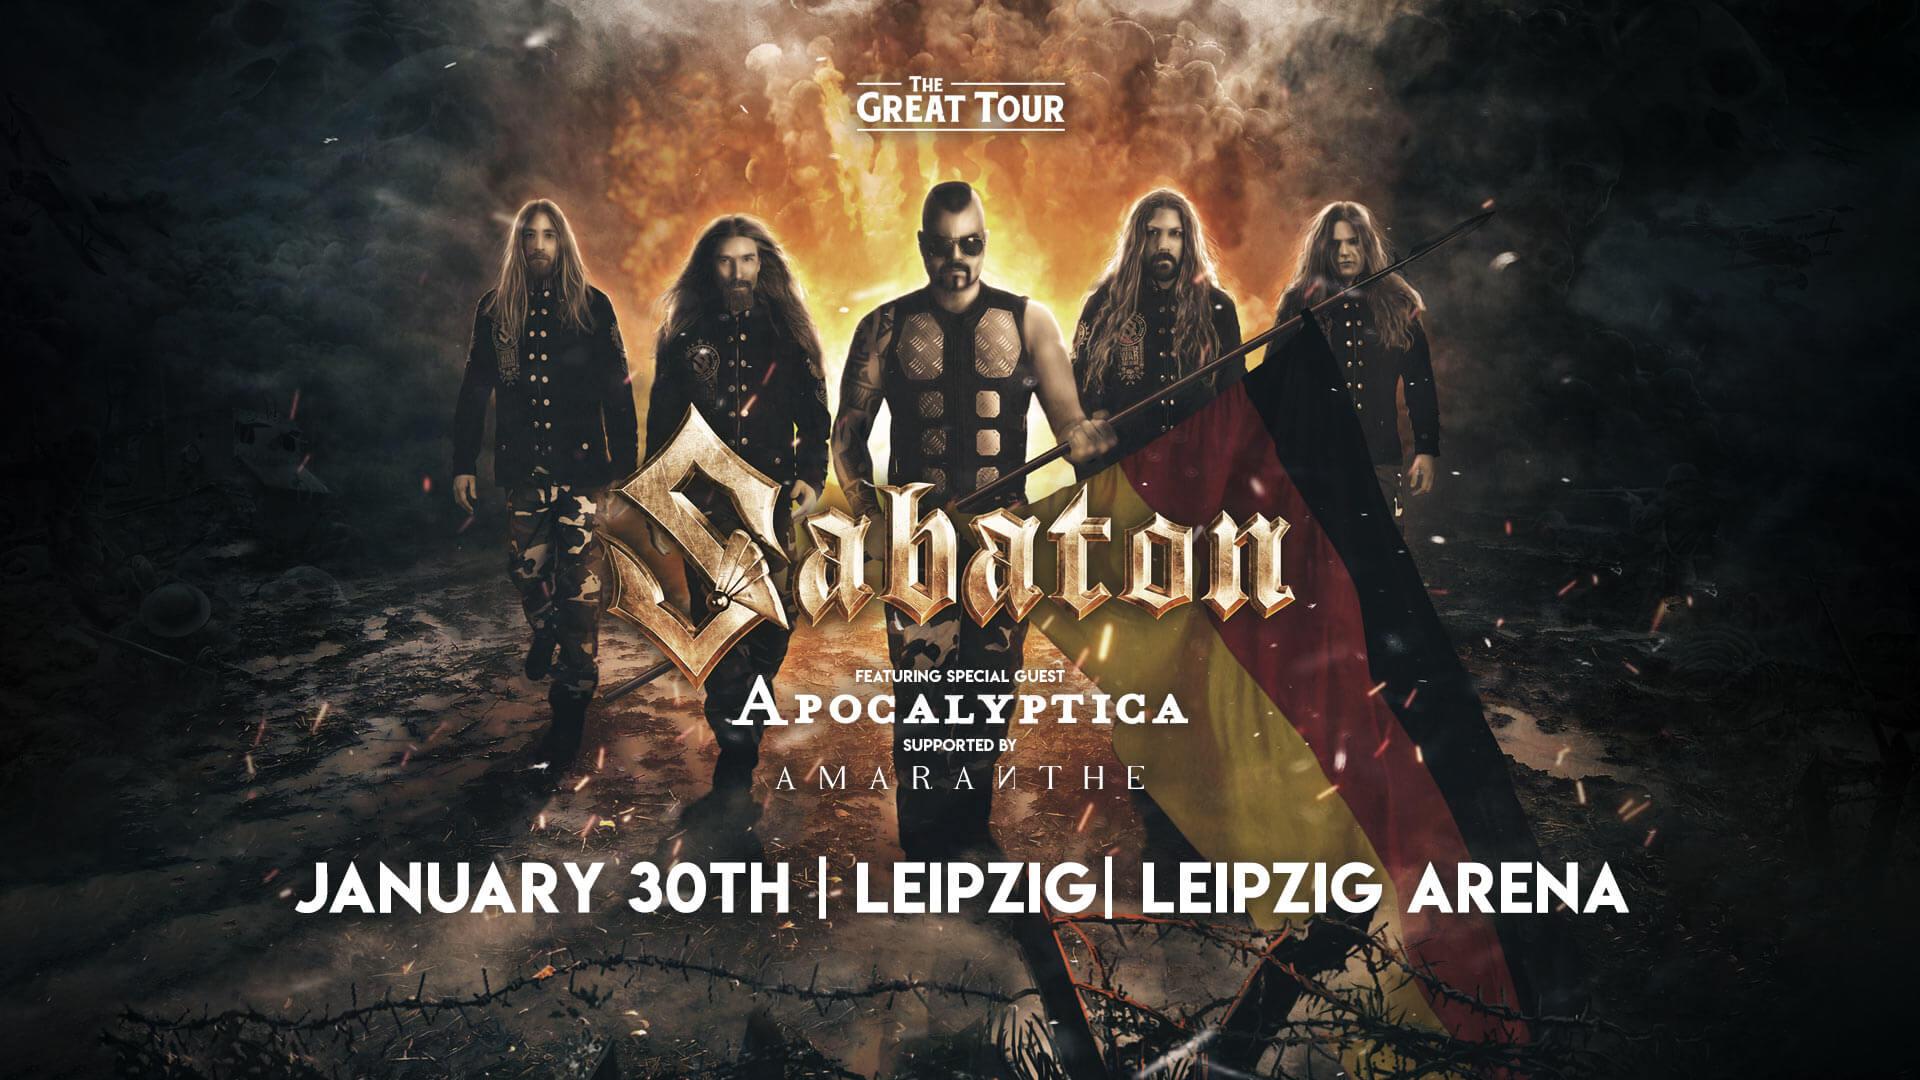 Sabaton Live in Leipzig - January 30th 2019, Leipzig Arena